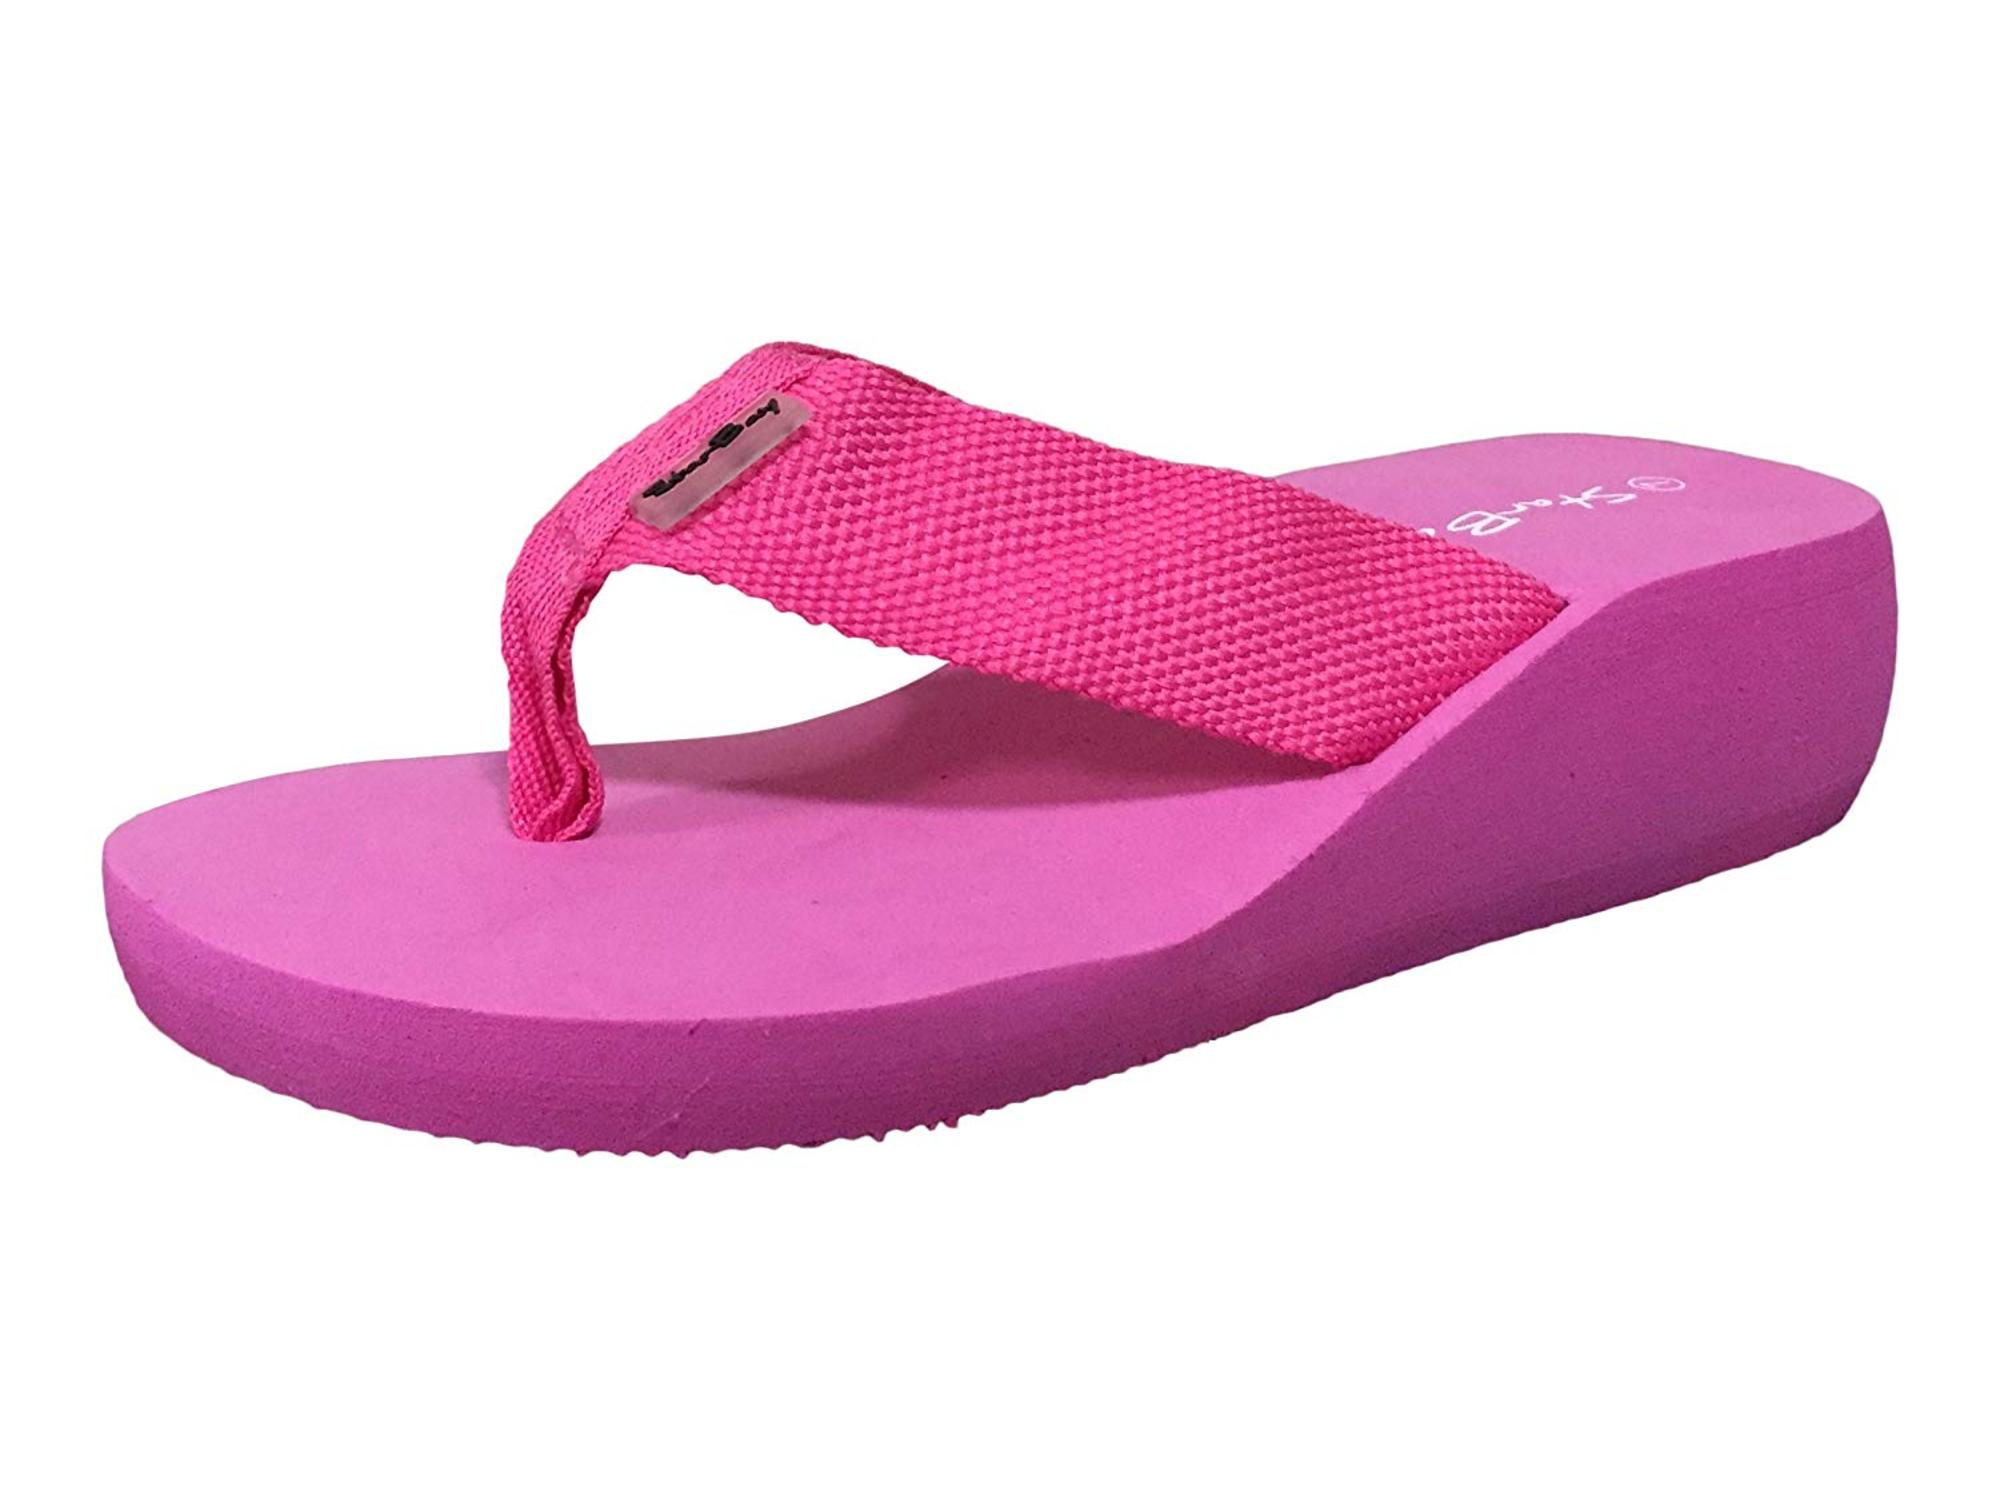 b416f2c02 Starbay Women s Lightweight Canvas Thong Sandal Flip Flops